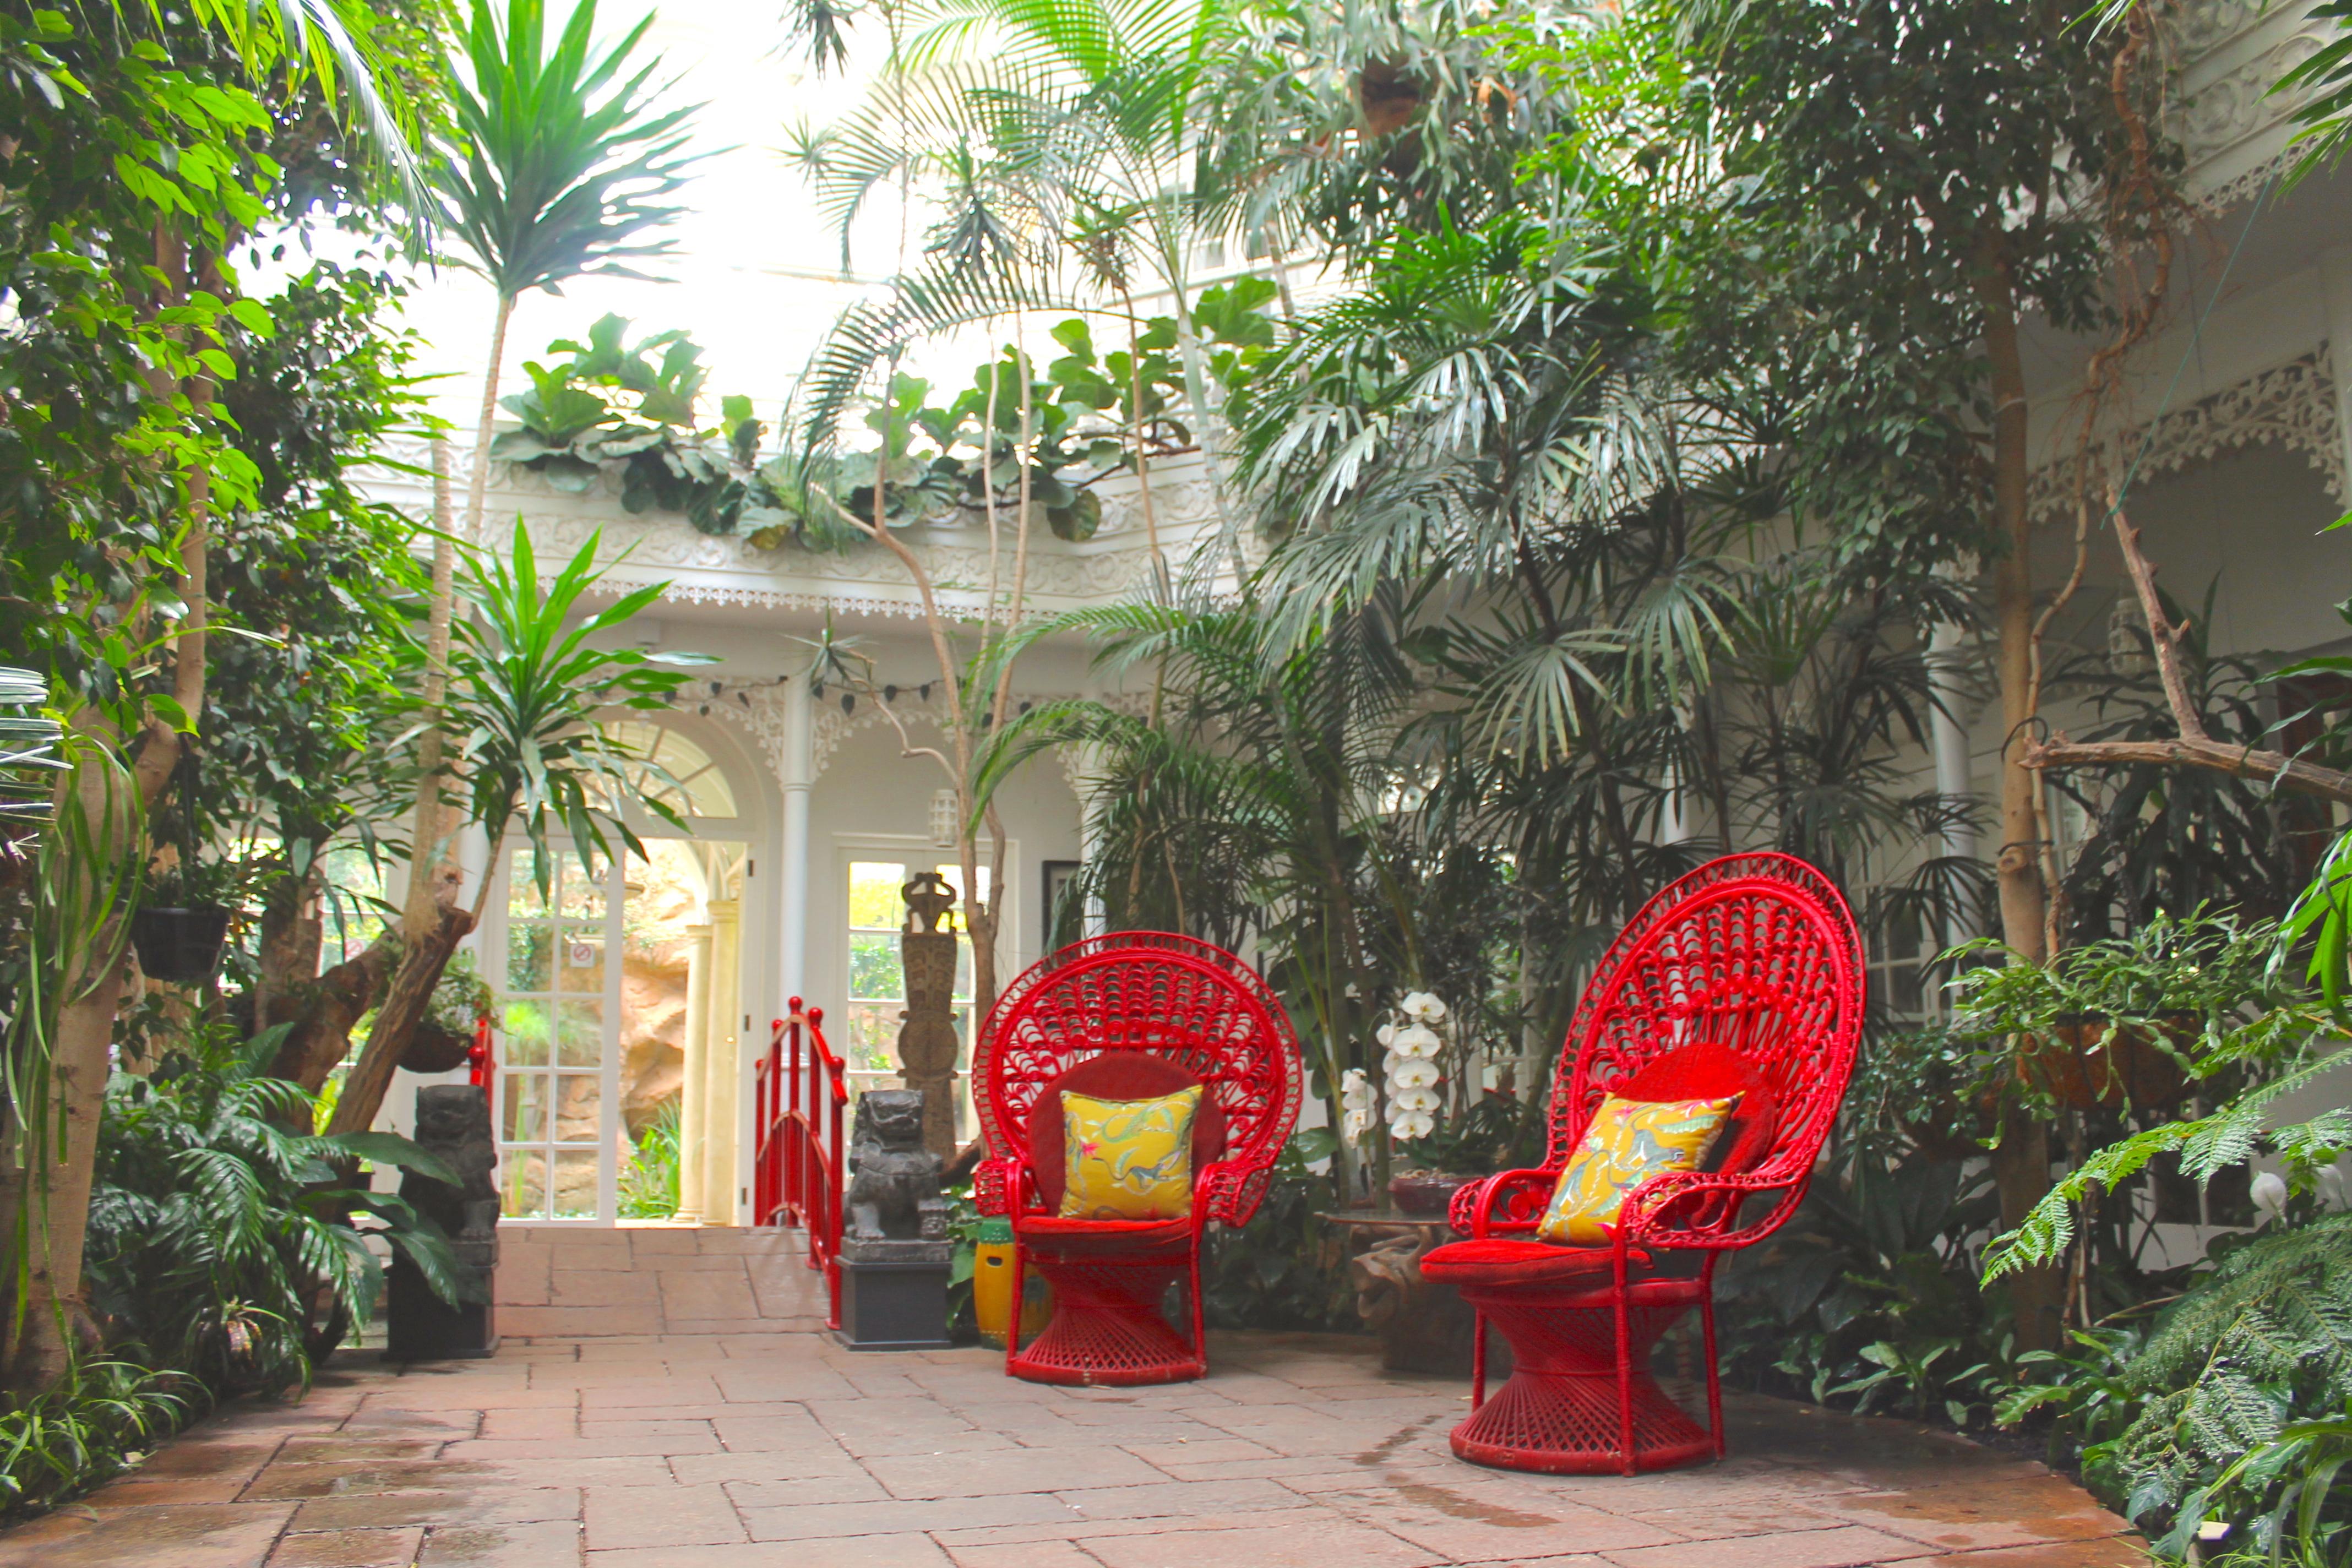 munro-hotel-garden-indoor-johannesburg-lustforthesublime